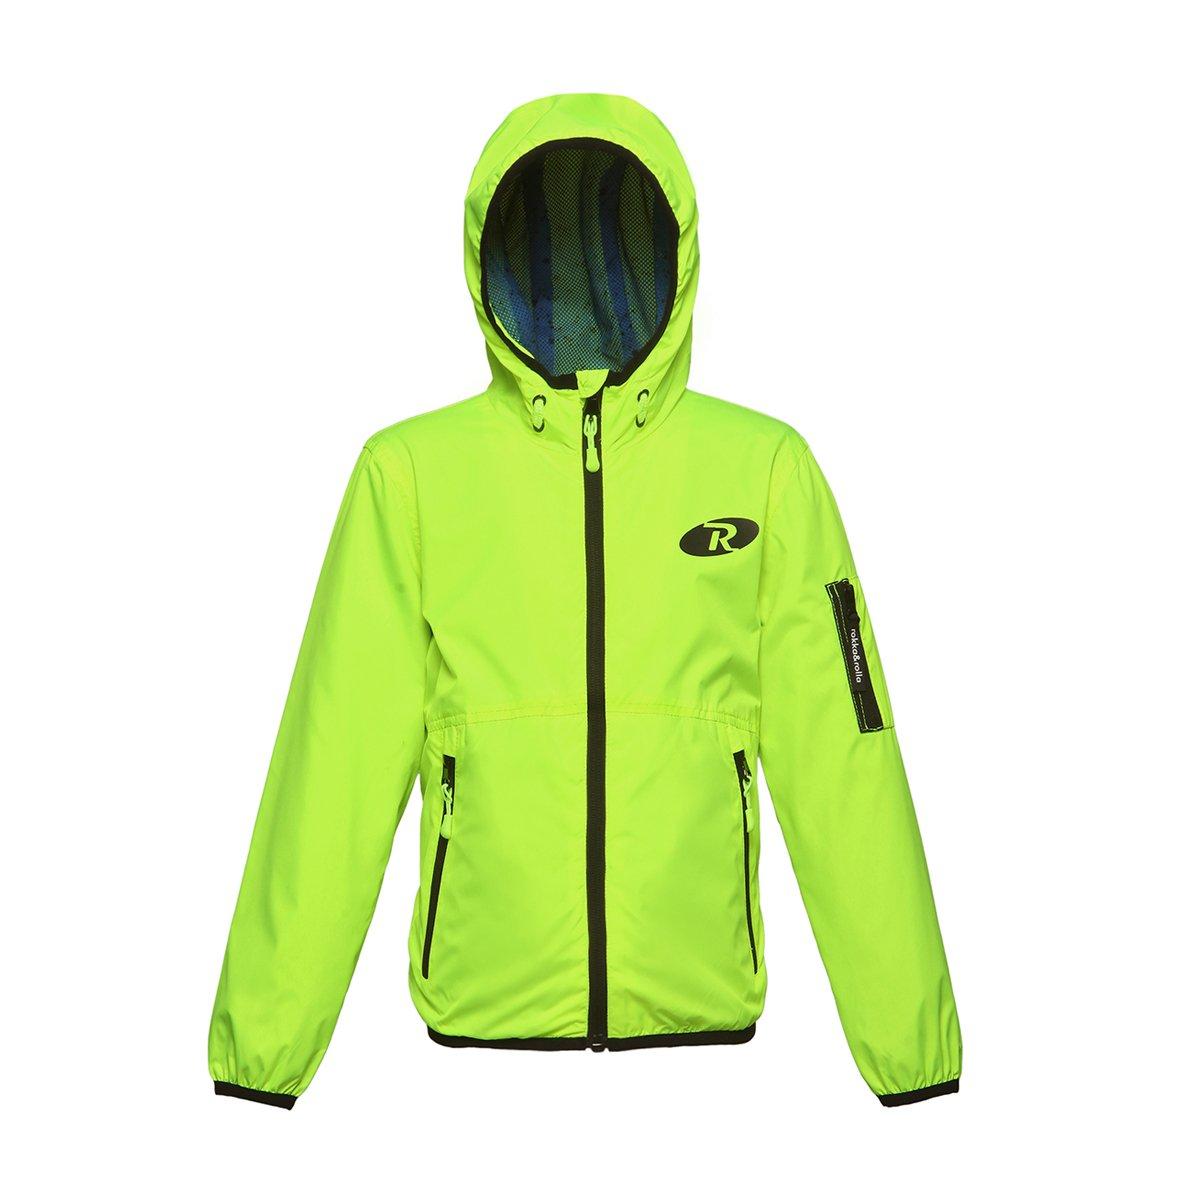 Rokka&Rolla Boys' Lightweight Water Resistant Zip-Up Hooded Windbreaker Jacket Neon Green